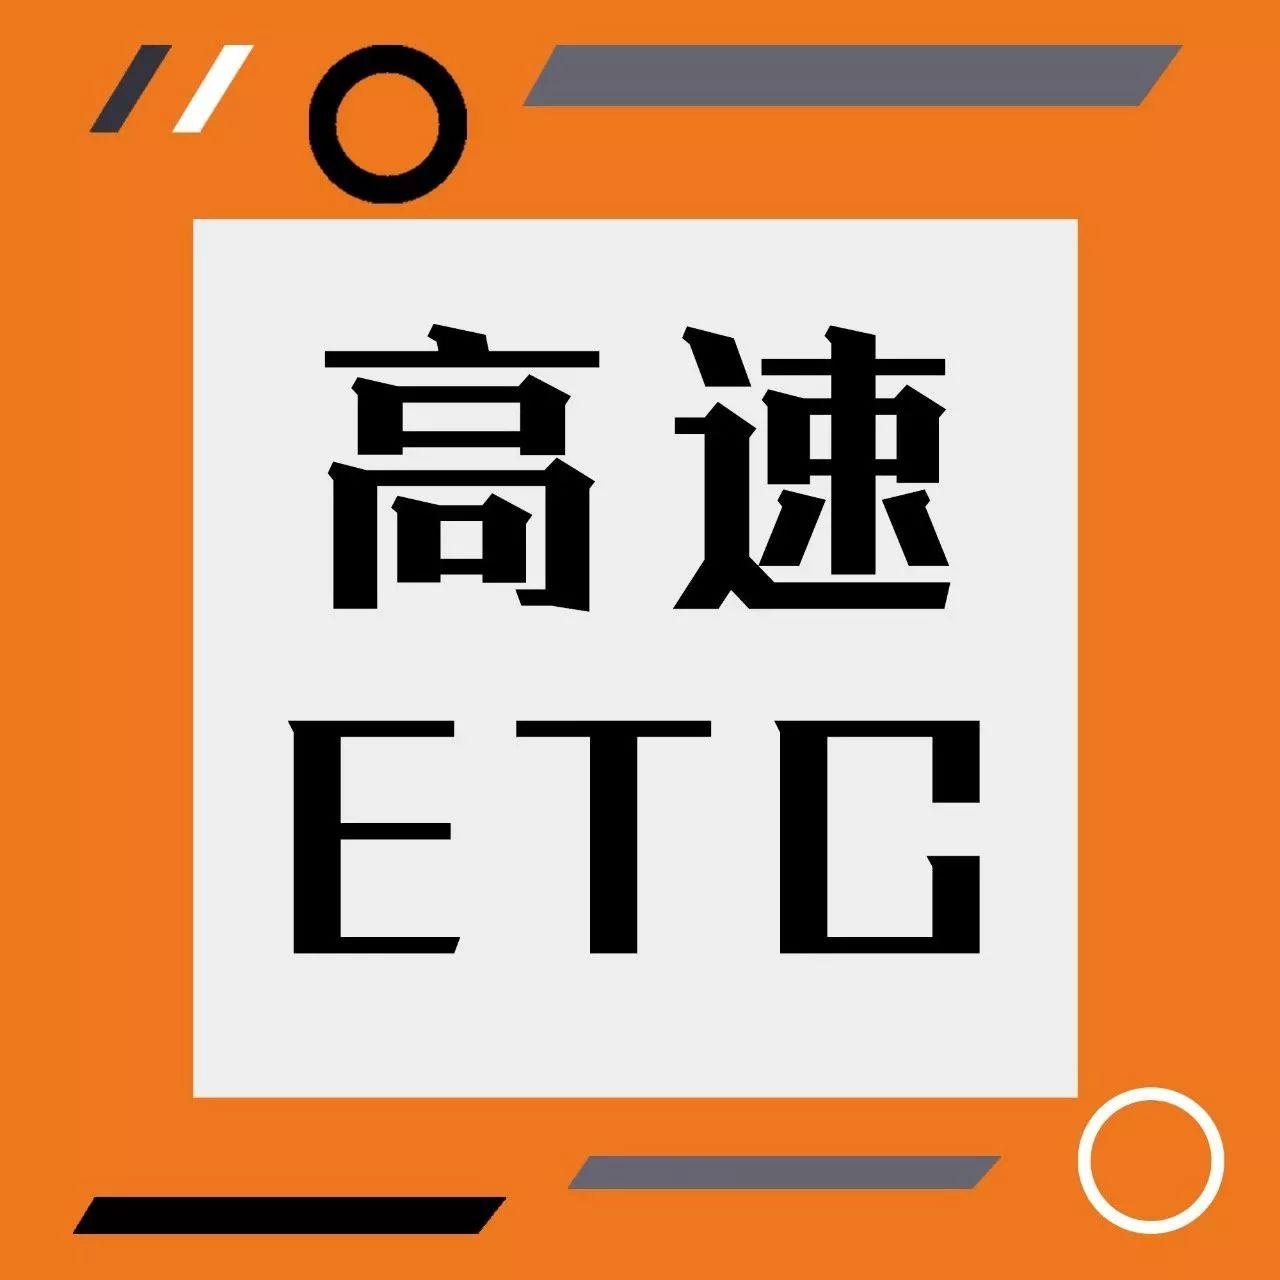 ETC有什么好�?�槭裁慈巳硕荚谘b?